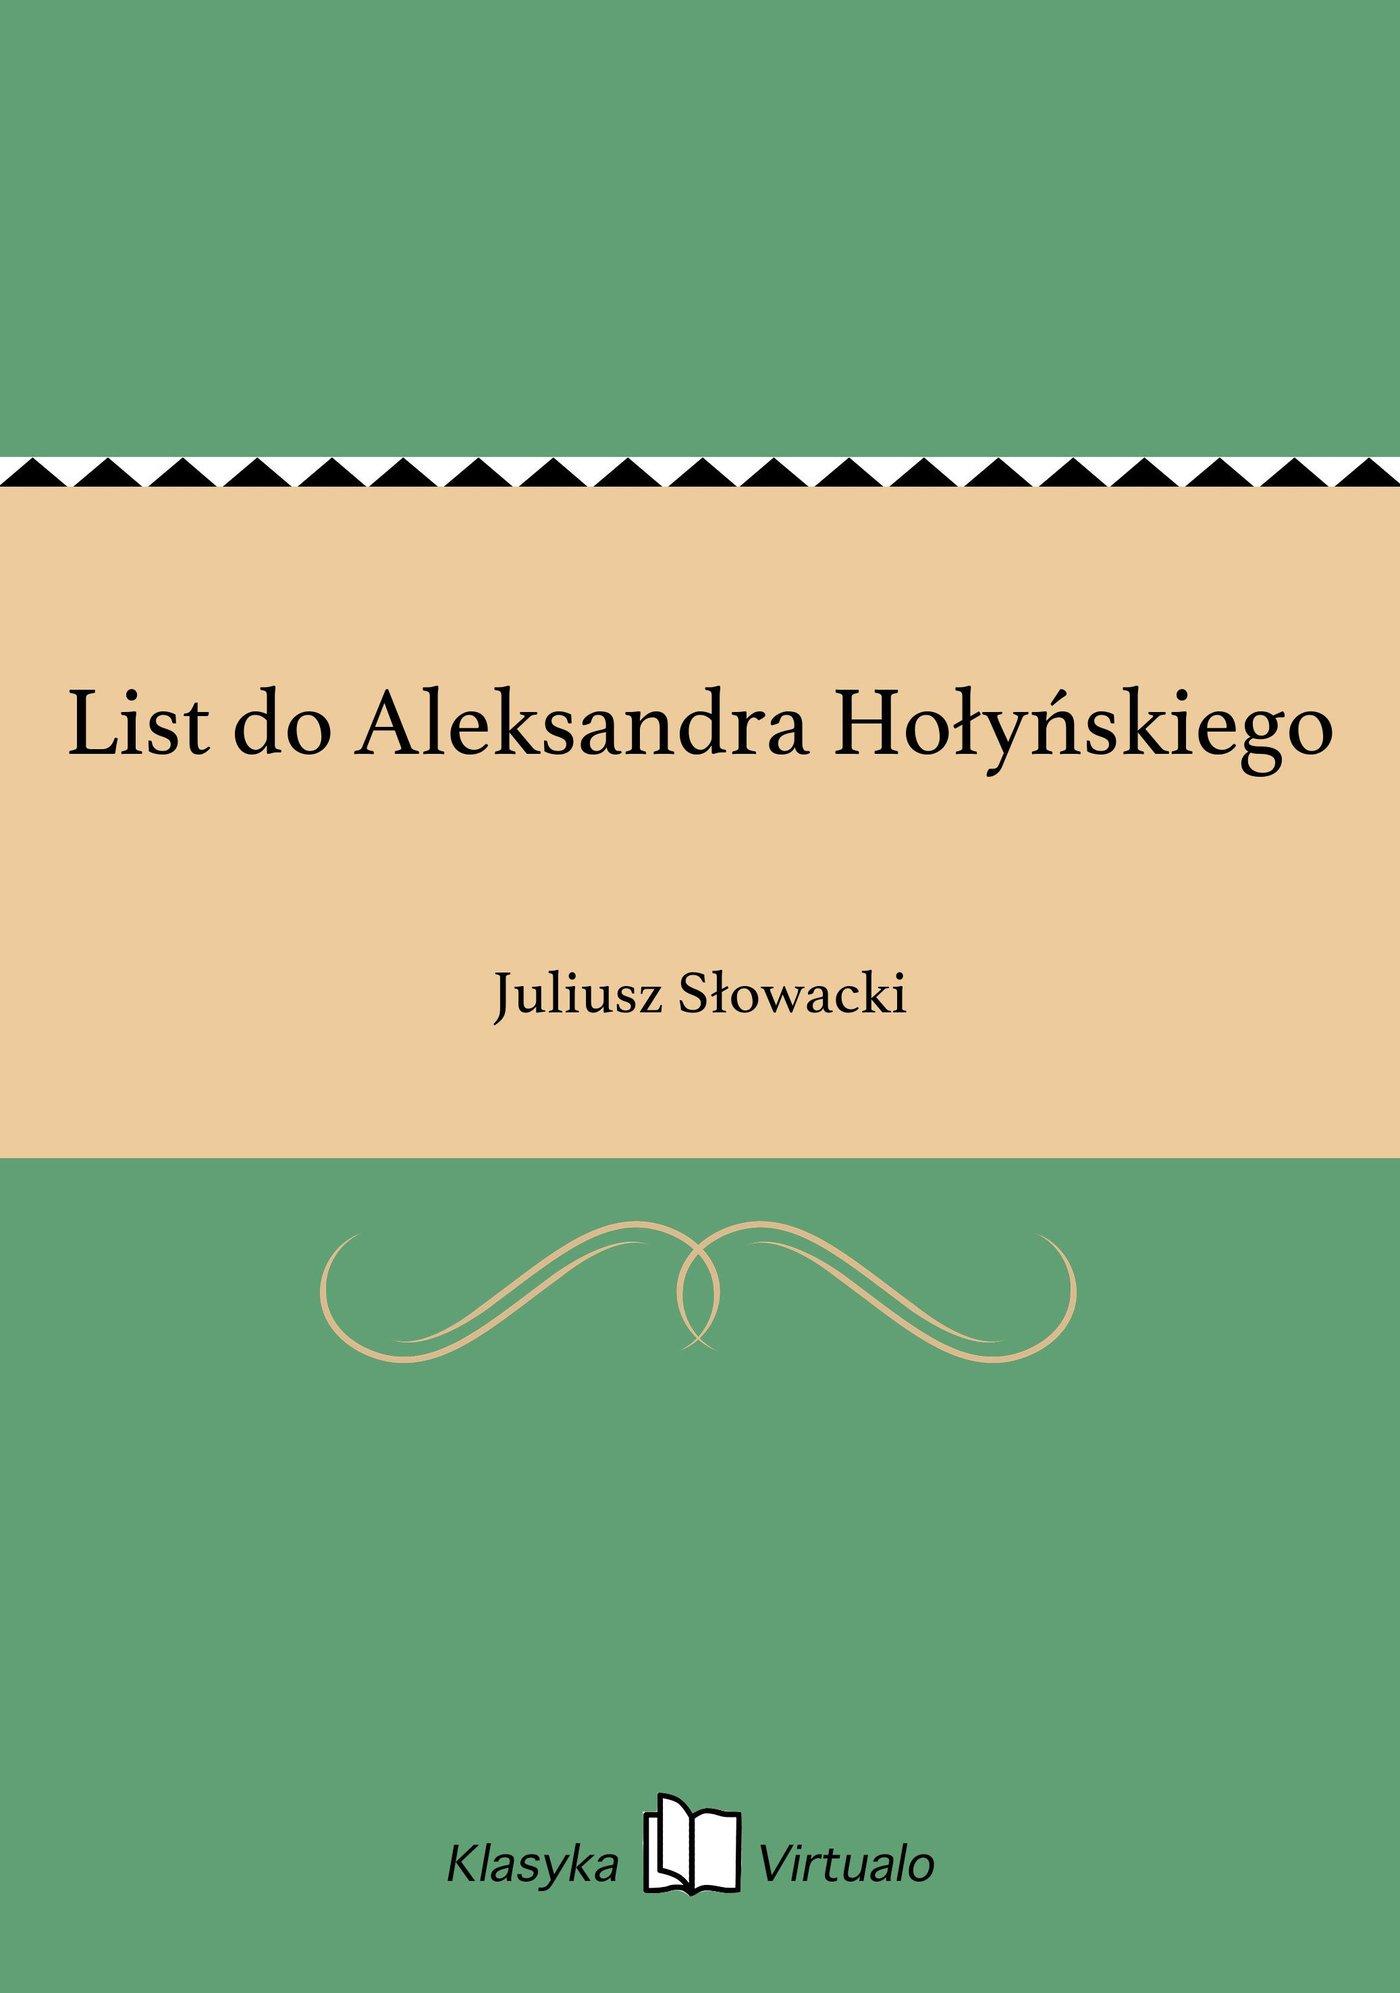 List do Aleksandra Hołyńskiego - Ebook (Książka na Kindle) do pobrania w formacie MOBI